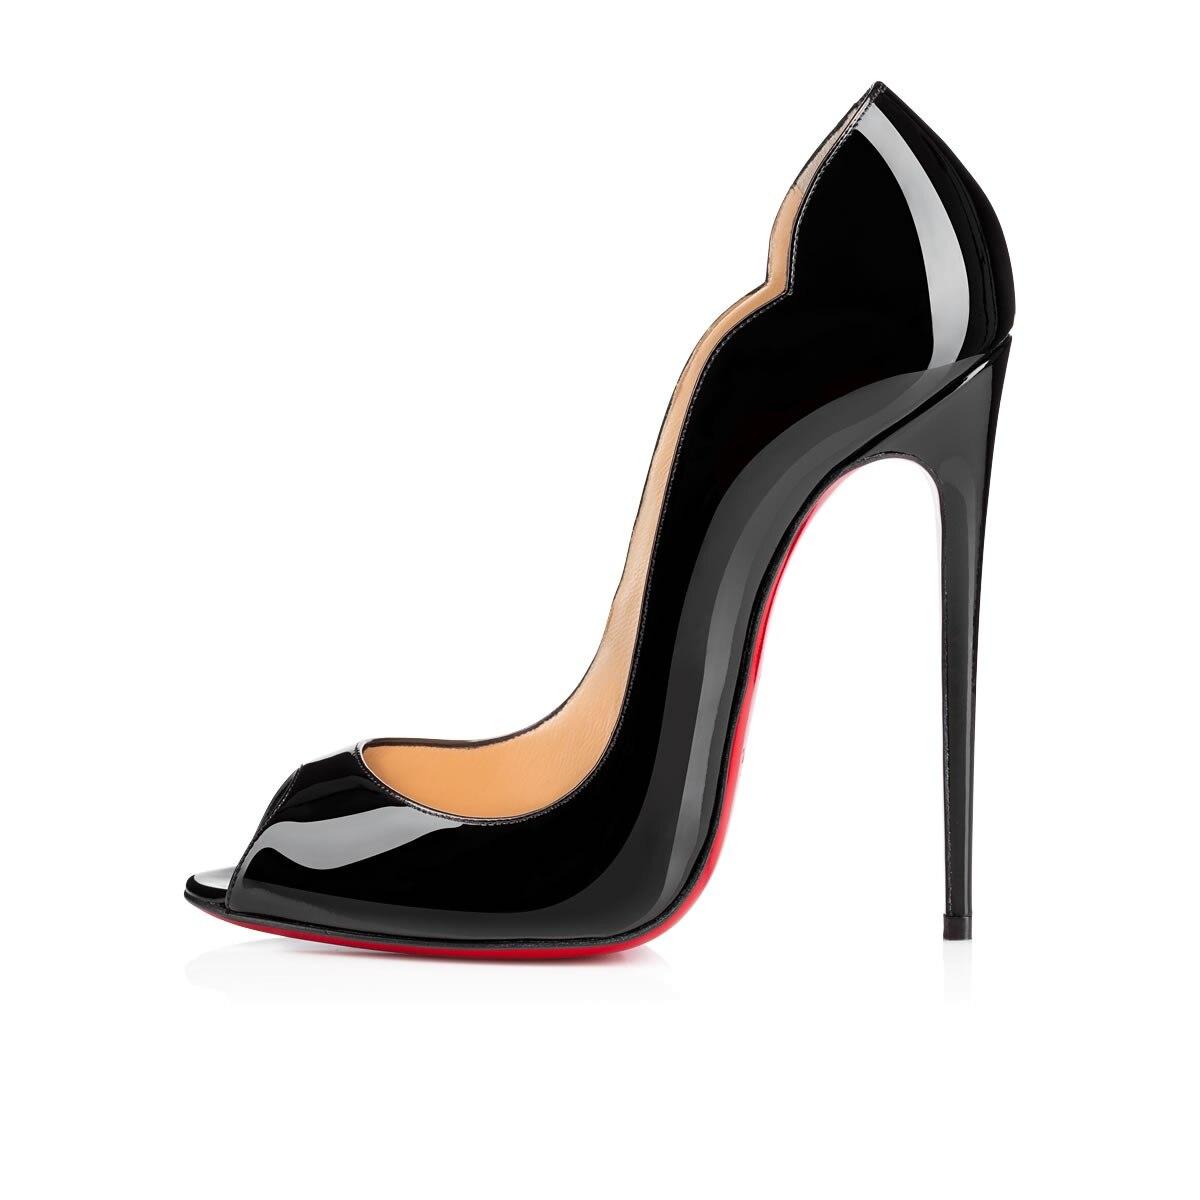 Luxury Pumps Clear Sexy Platform Women High Heels 8 10 12cm Fashion Casual Mules Red Bottom Wedding